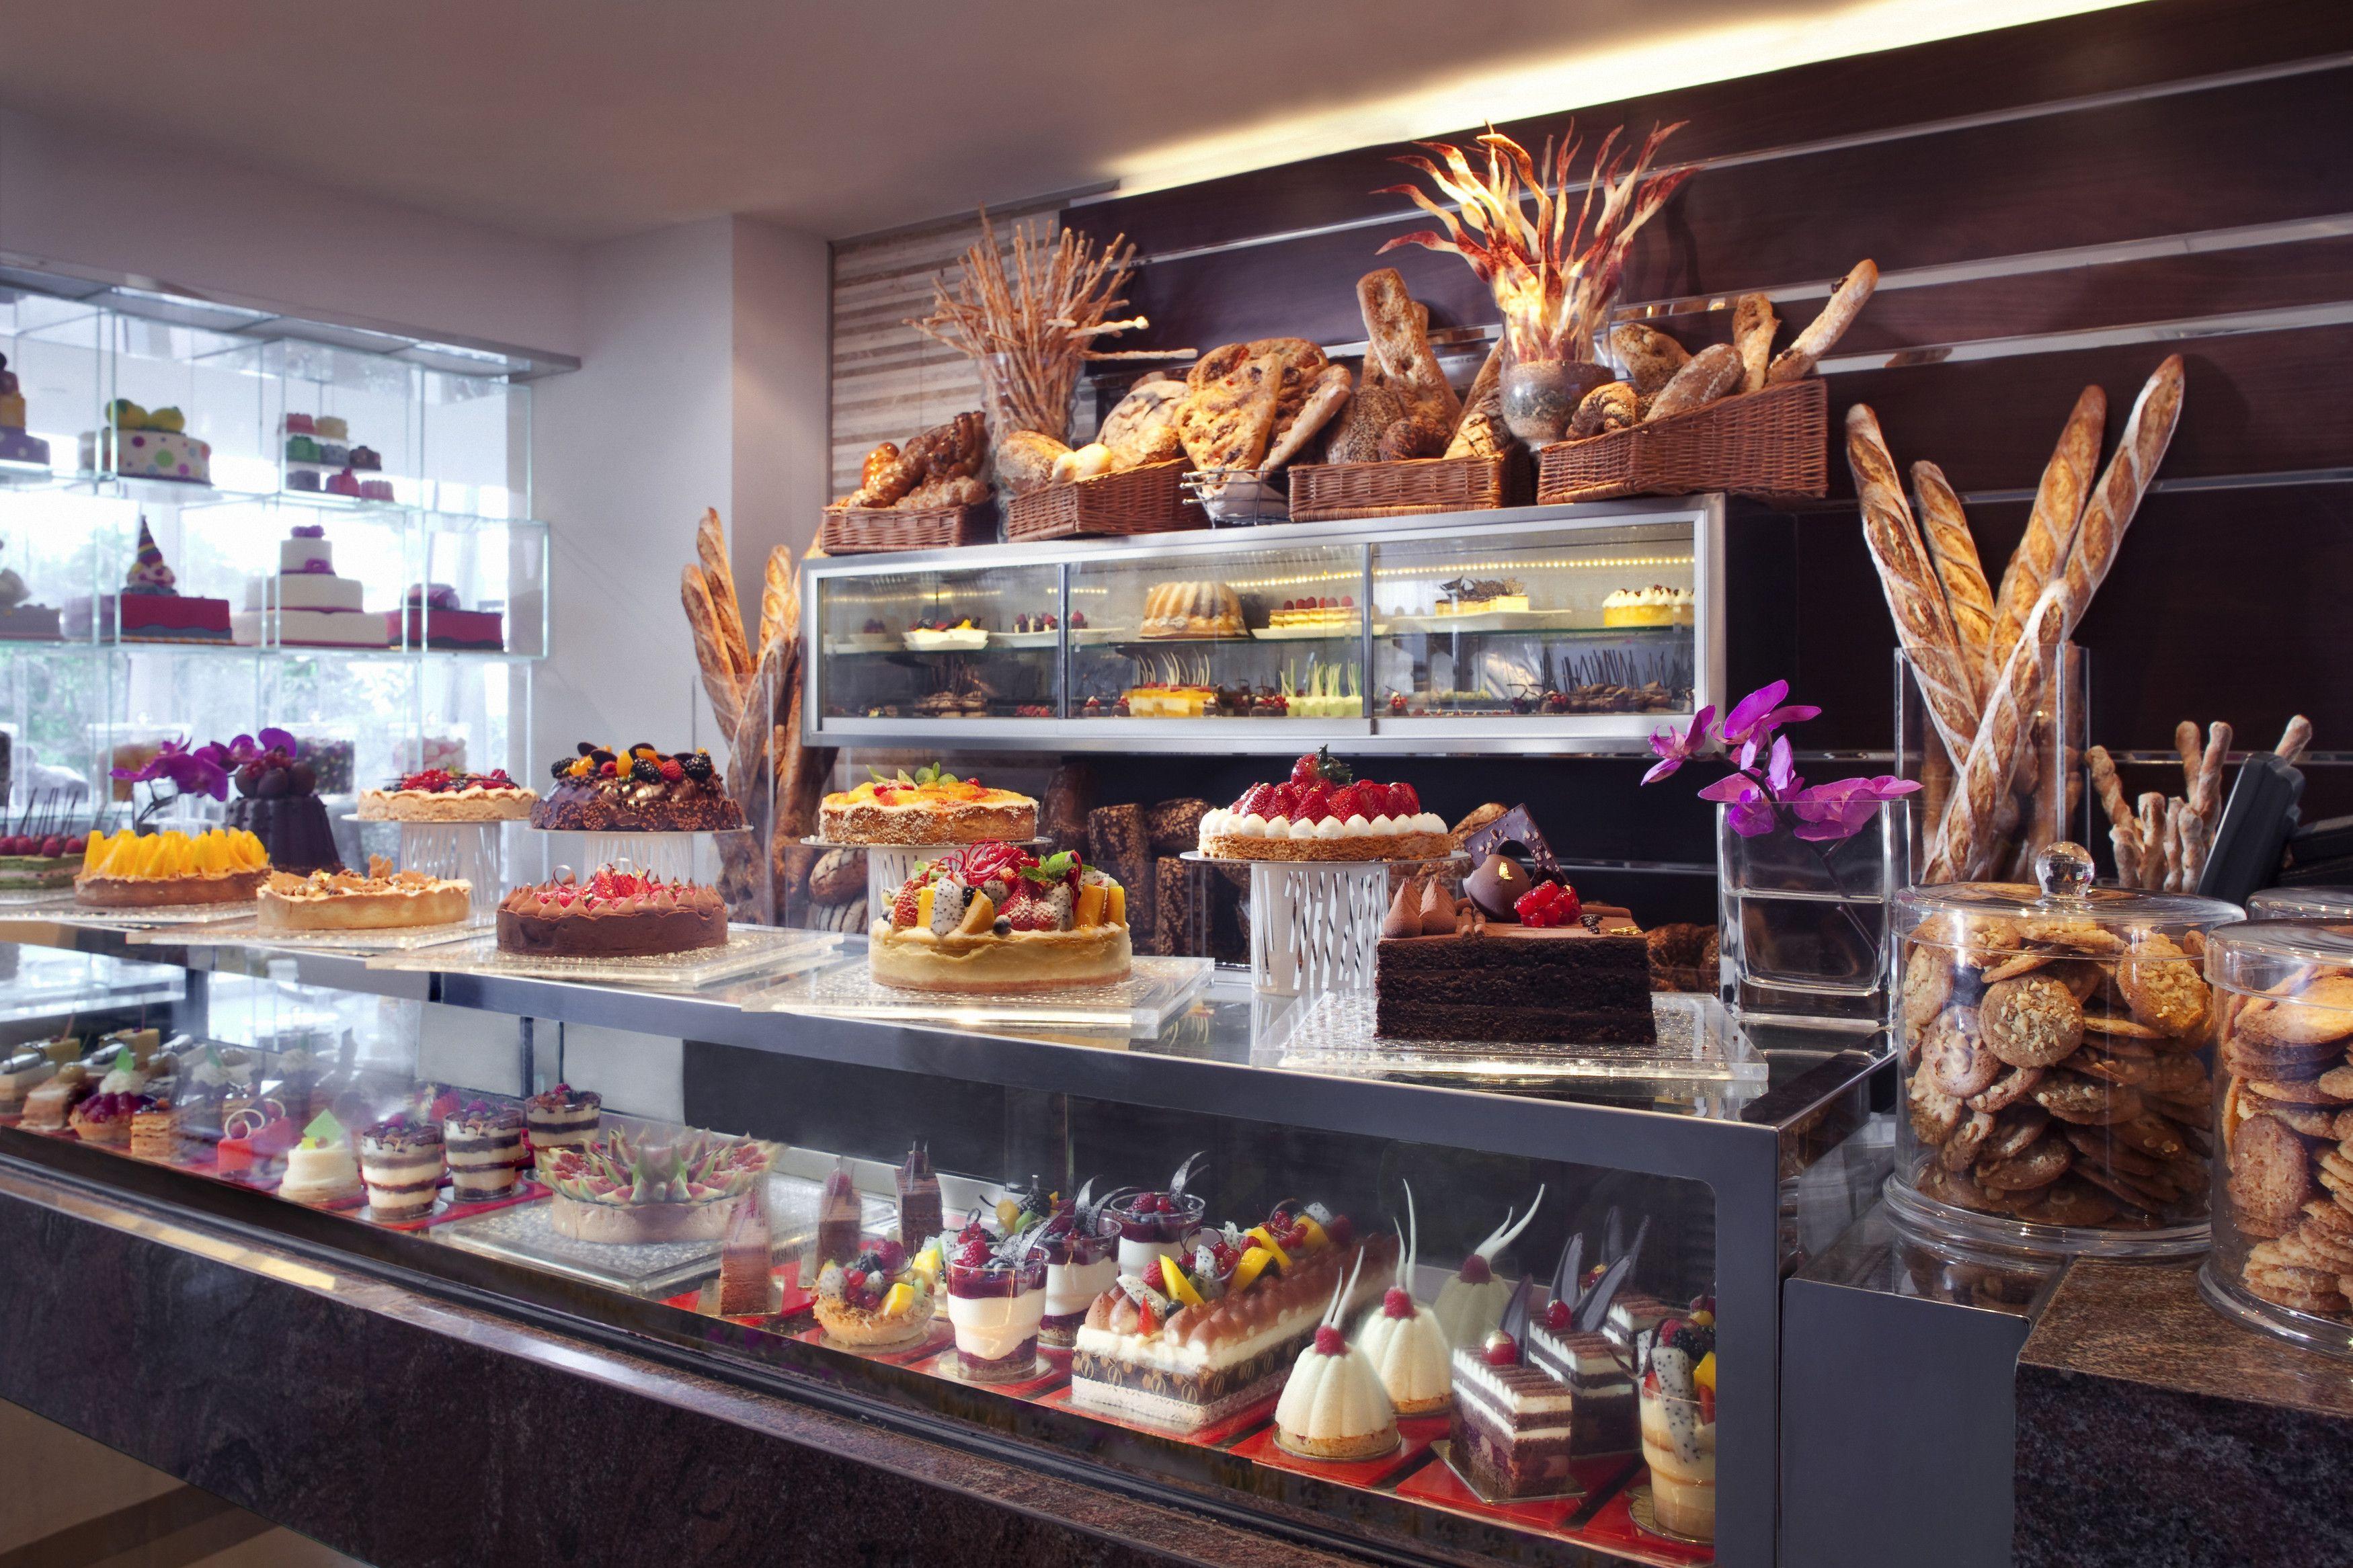 Jumeirah Beach Hotel Dubai Restaurants Laude Creations Bakery Cake